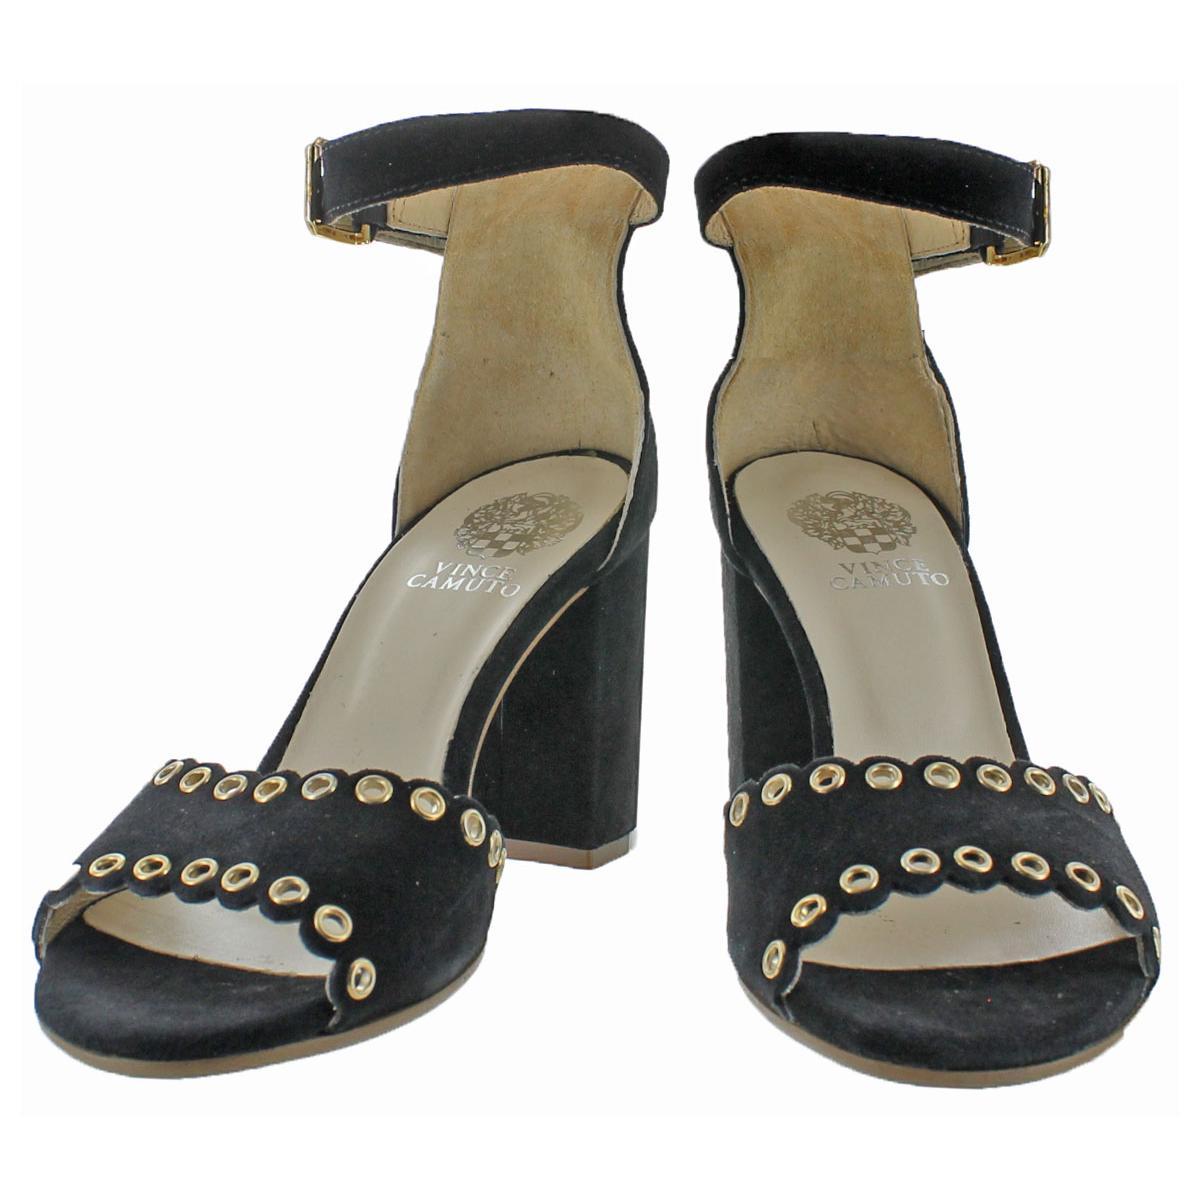 Vince-Camuto-Missy-Women-039-s-Suede-Open-Toe-Block-Heel-Dressy-Sandal-Shoes thumbnail 4